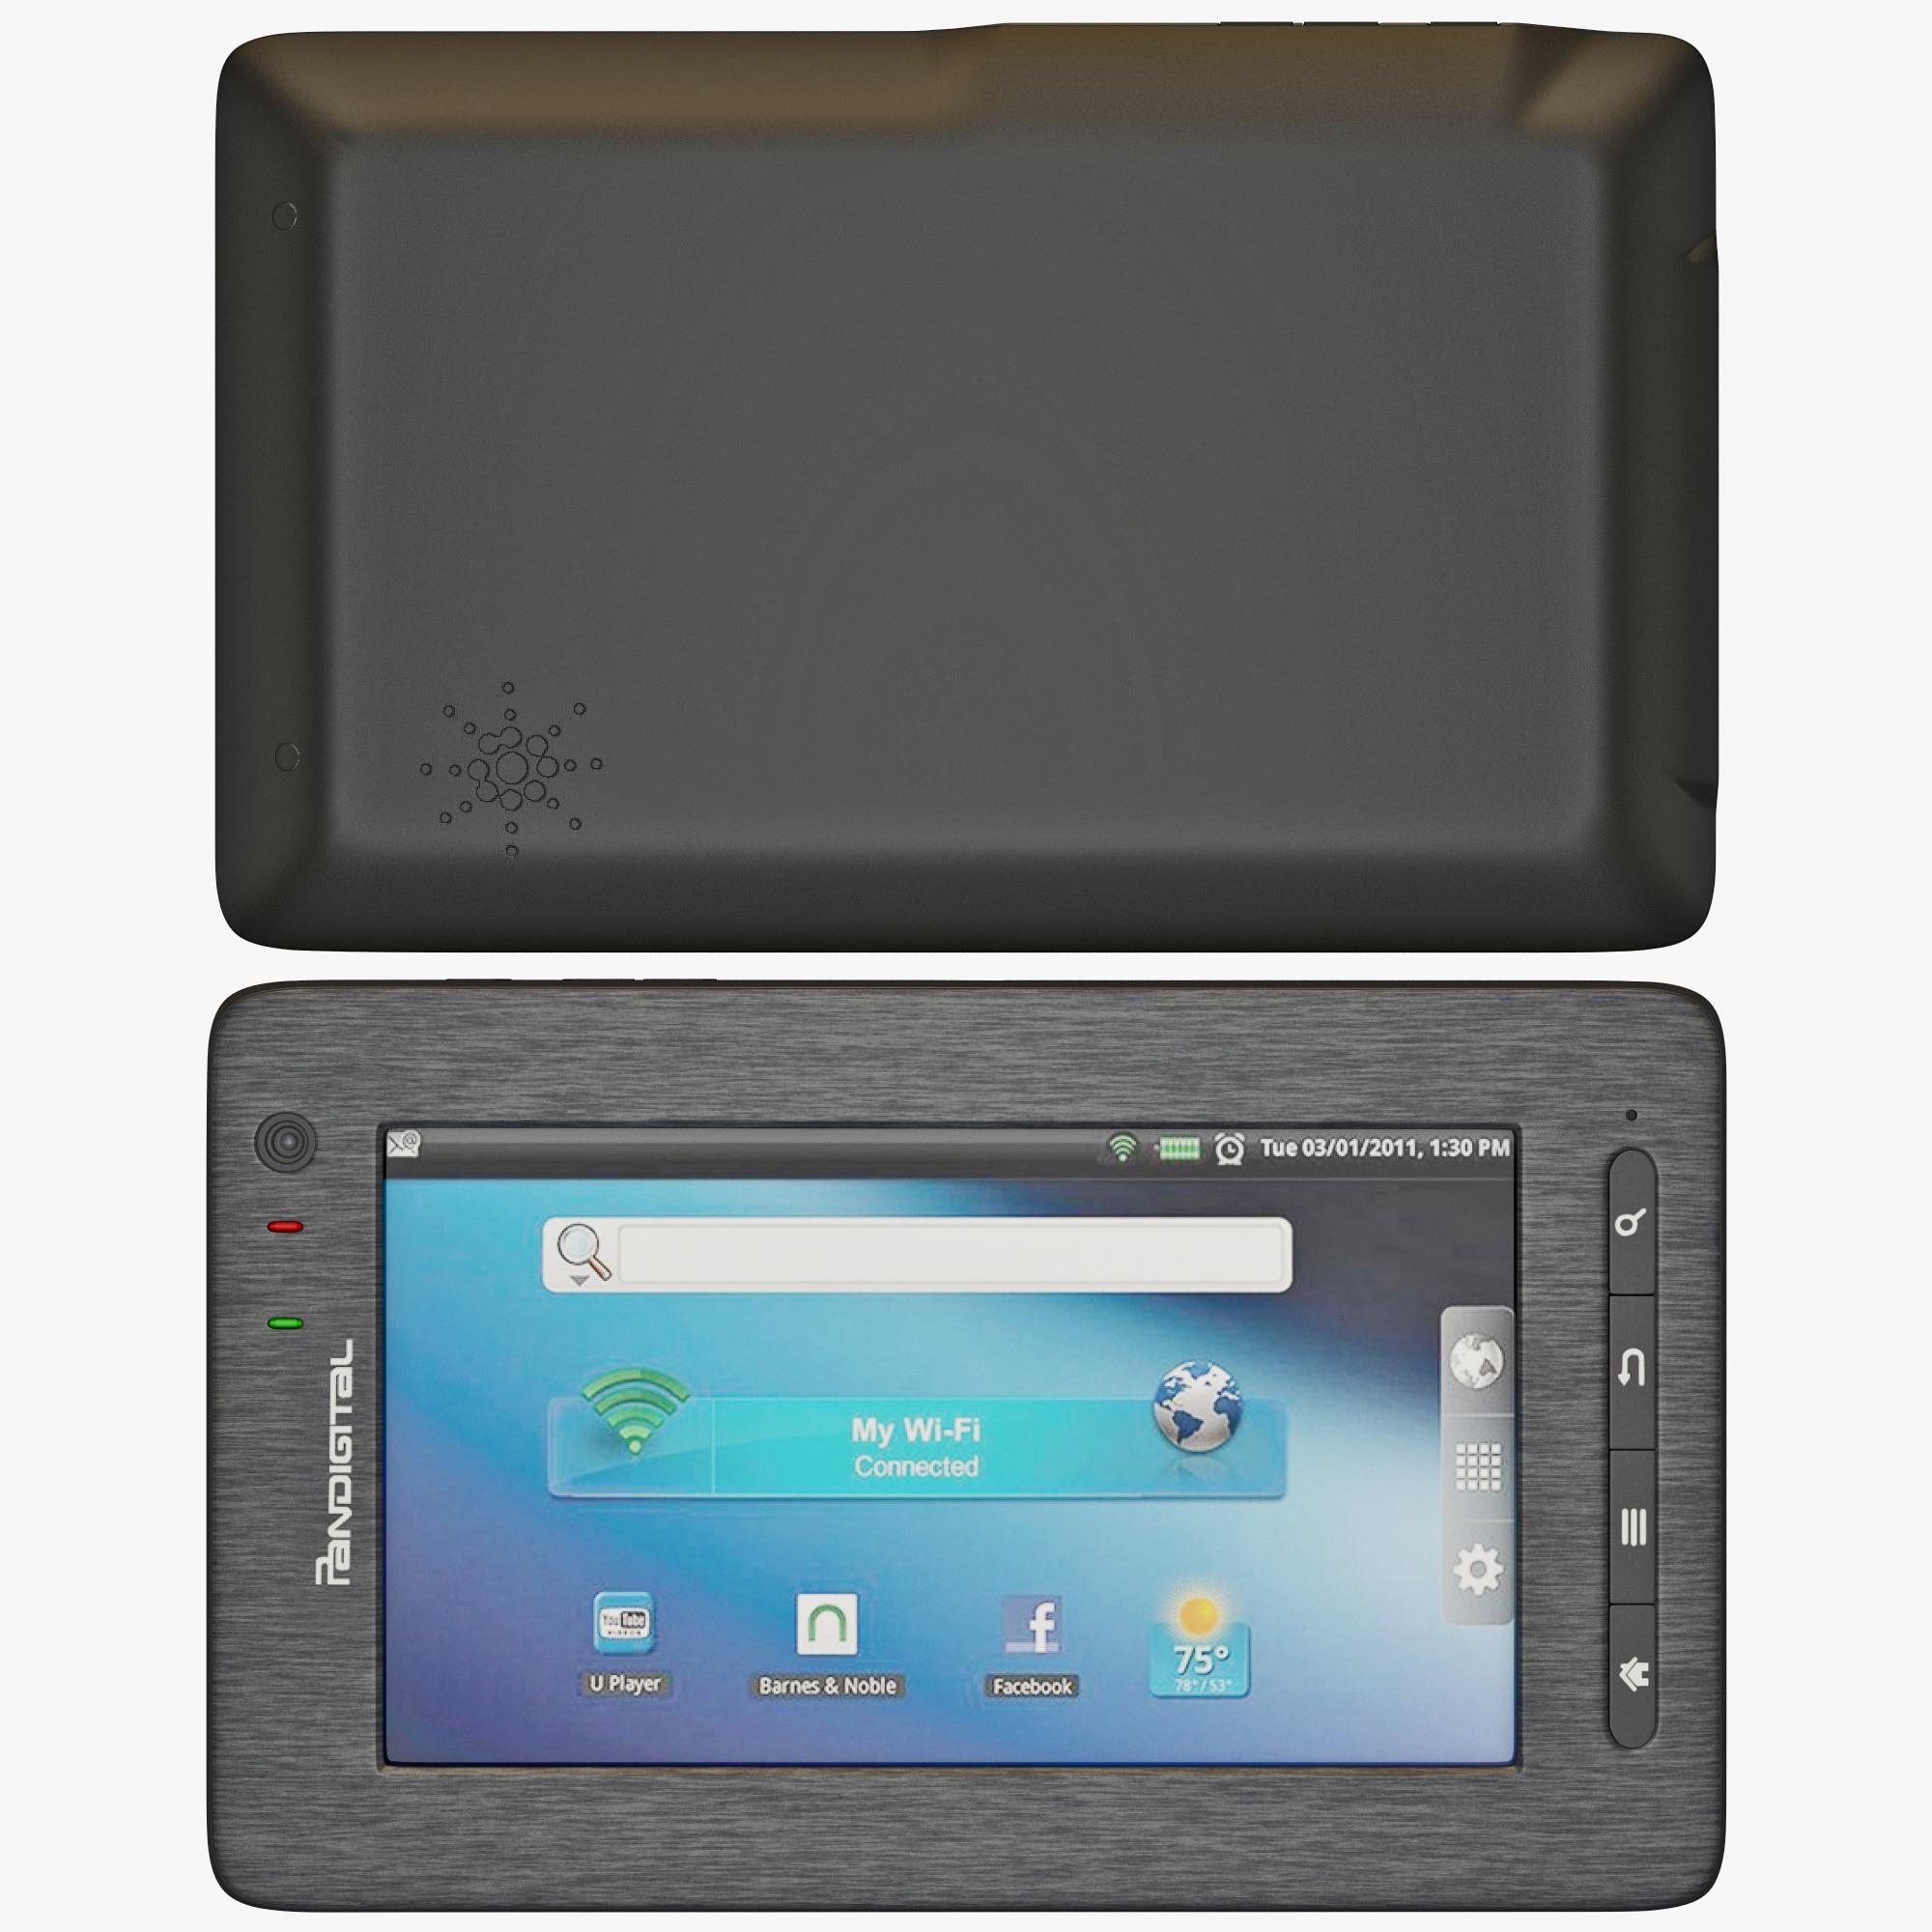 170339_Tablet_PanDigital_R70B200_Star_000.jpg